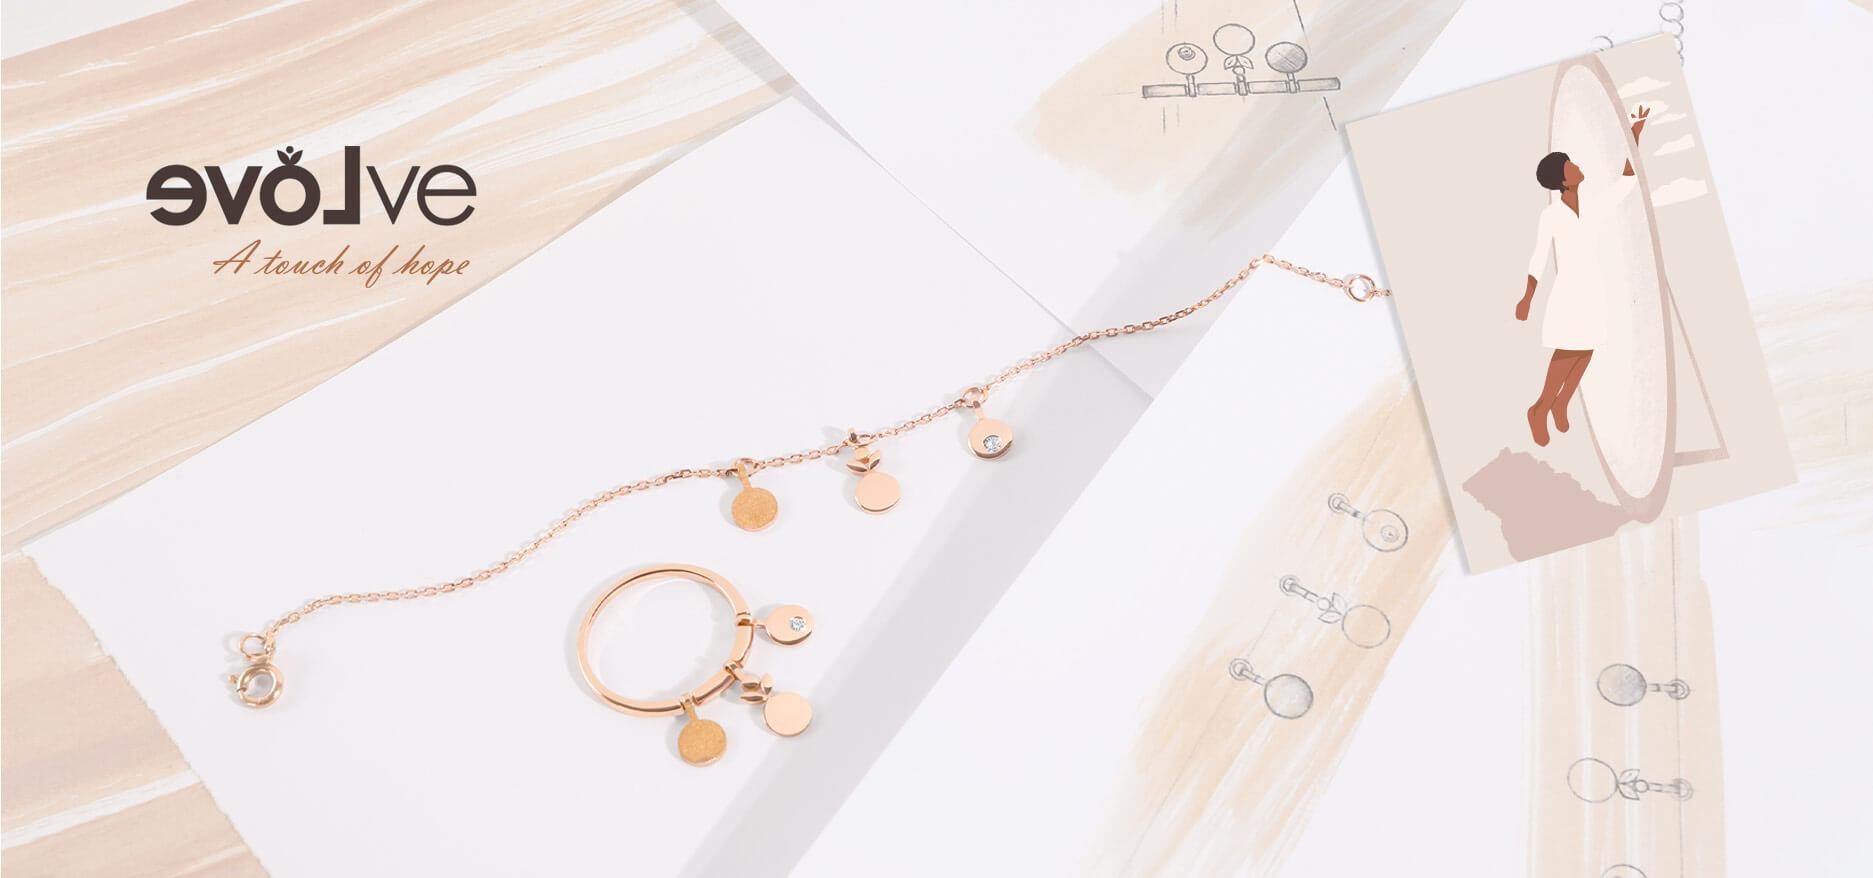 evolve diamond jewelry collection